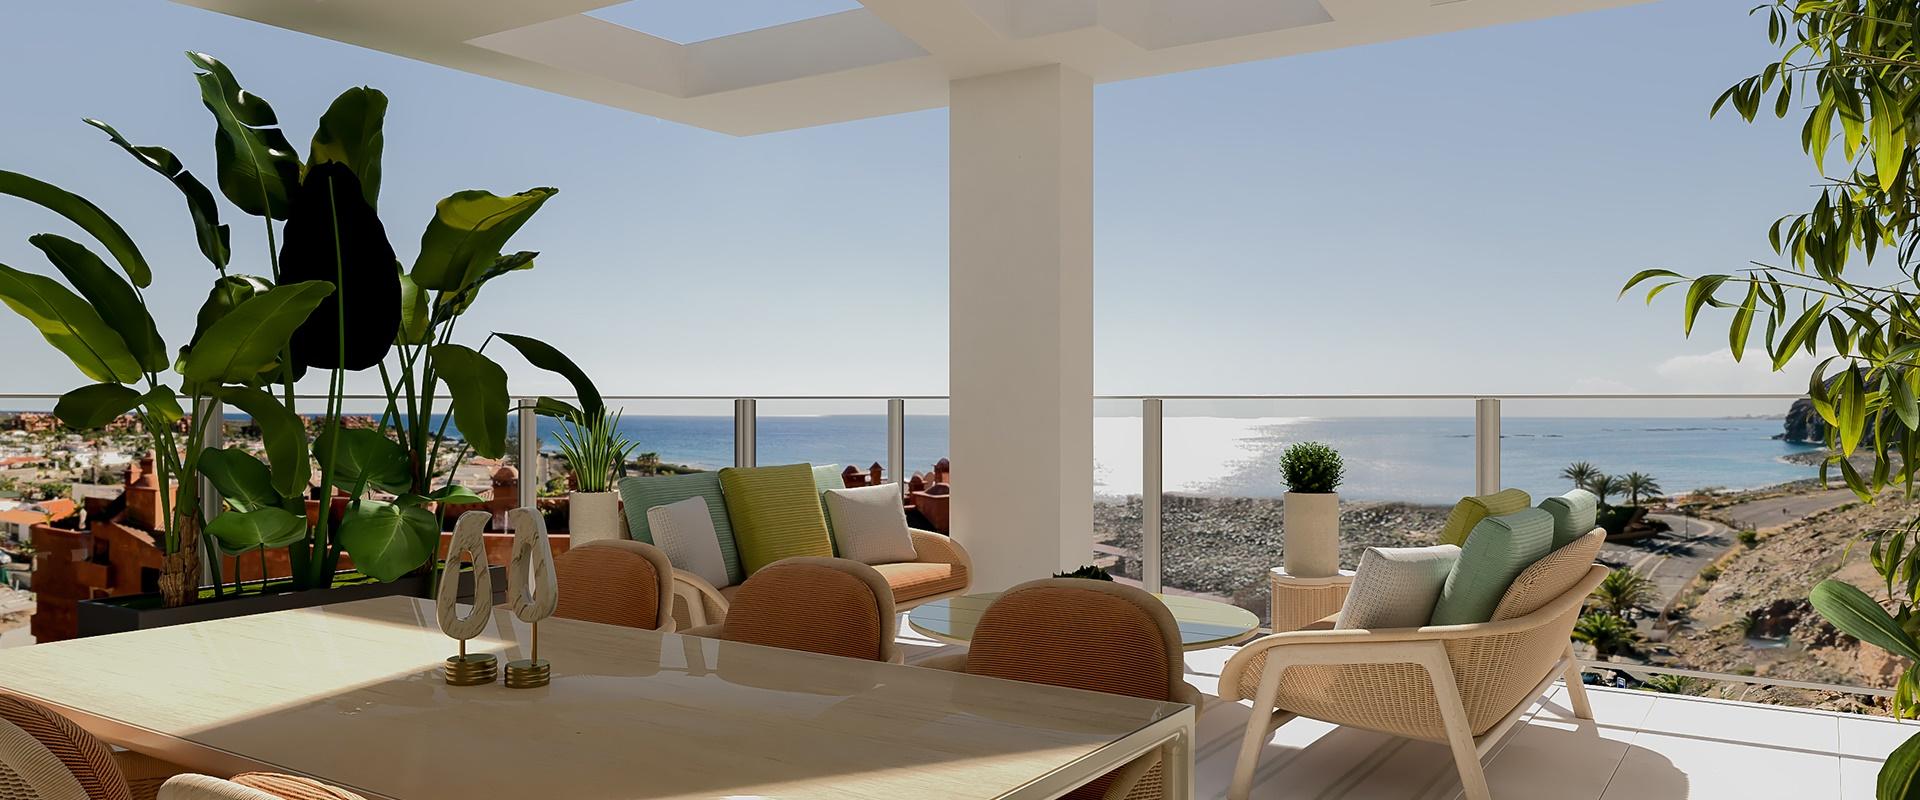 villa apartment for sale rent in Tenerife, your estate ...